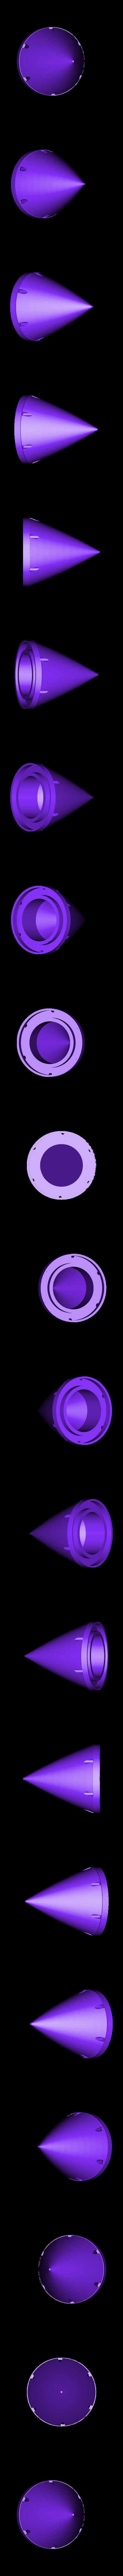 Spinner01ws.stl Download free STL file Jet Engine, 3-Spool • 3D printable object, konchan77